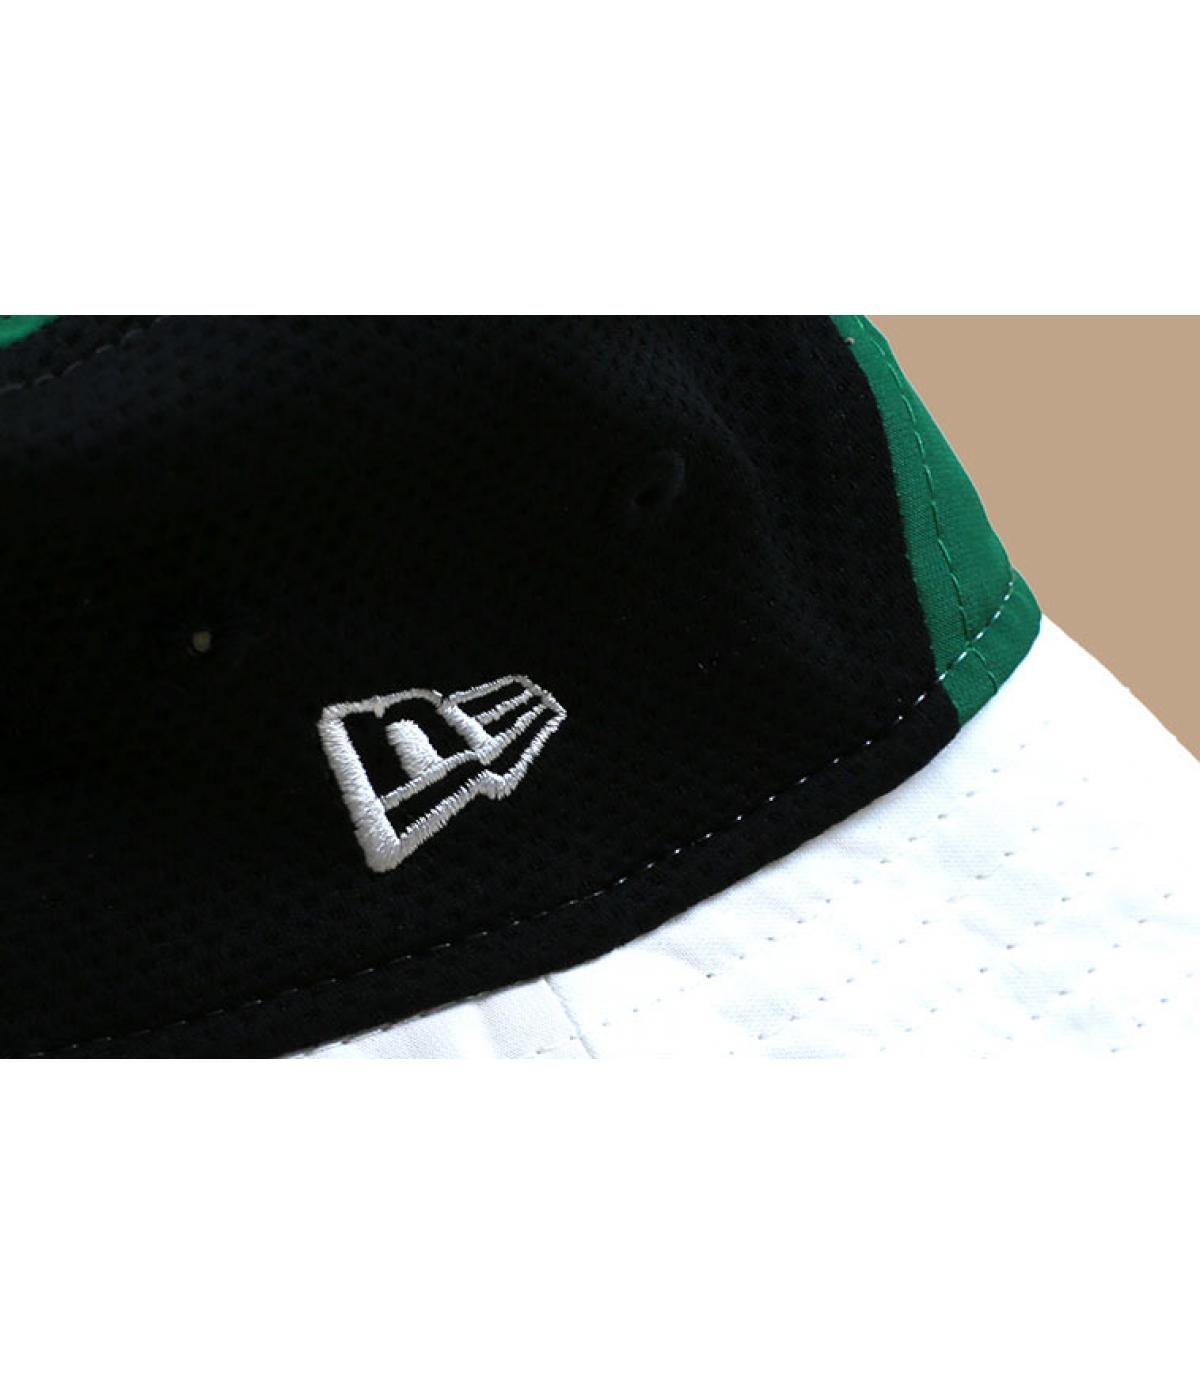 Détails Bucket NBA Team Celtics - image 3